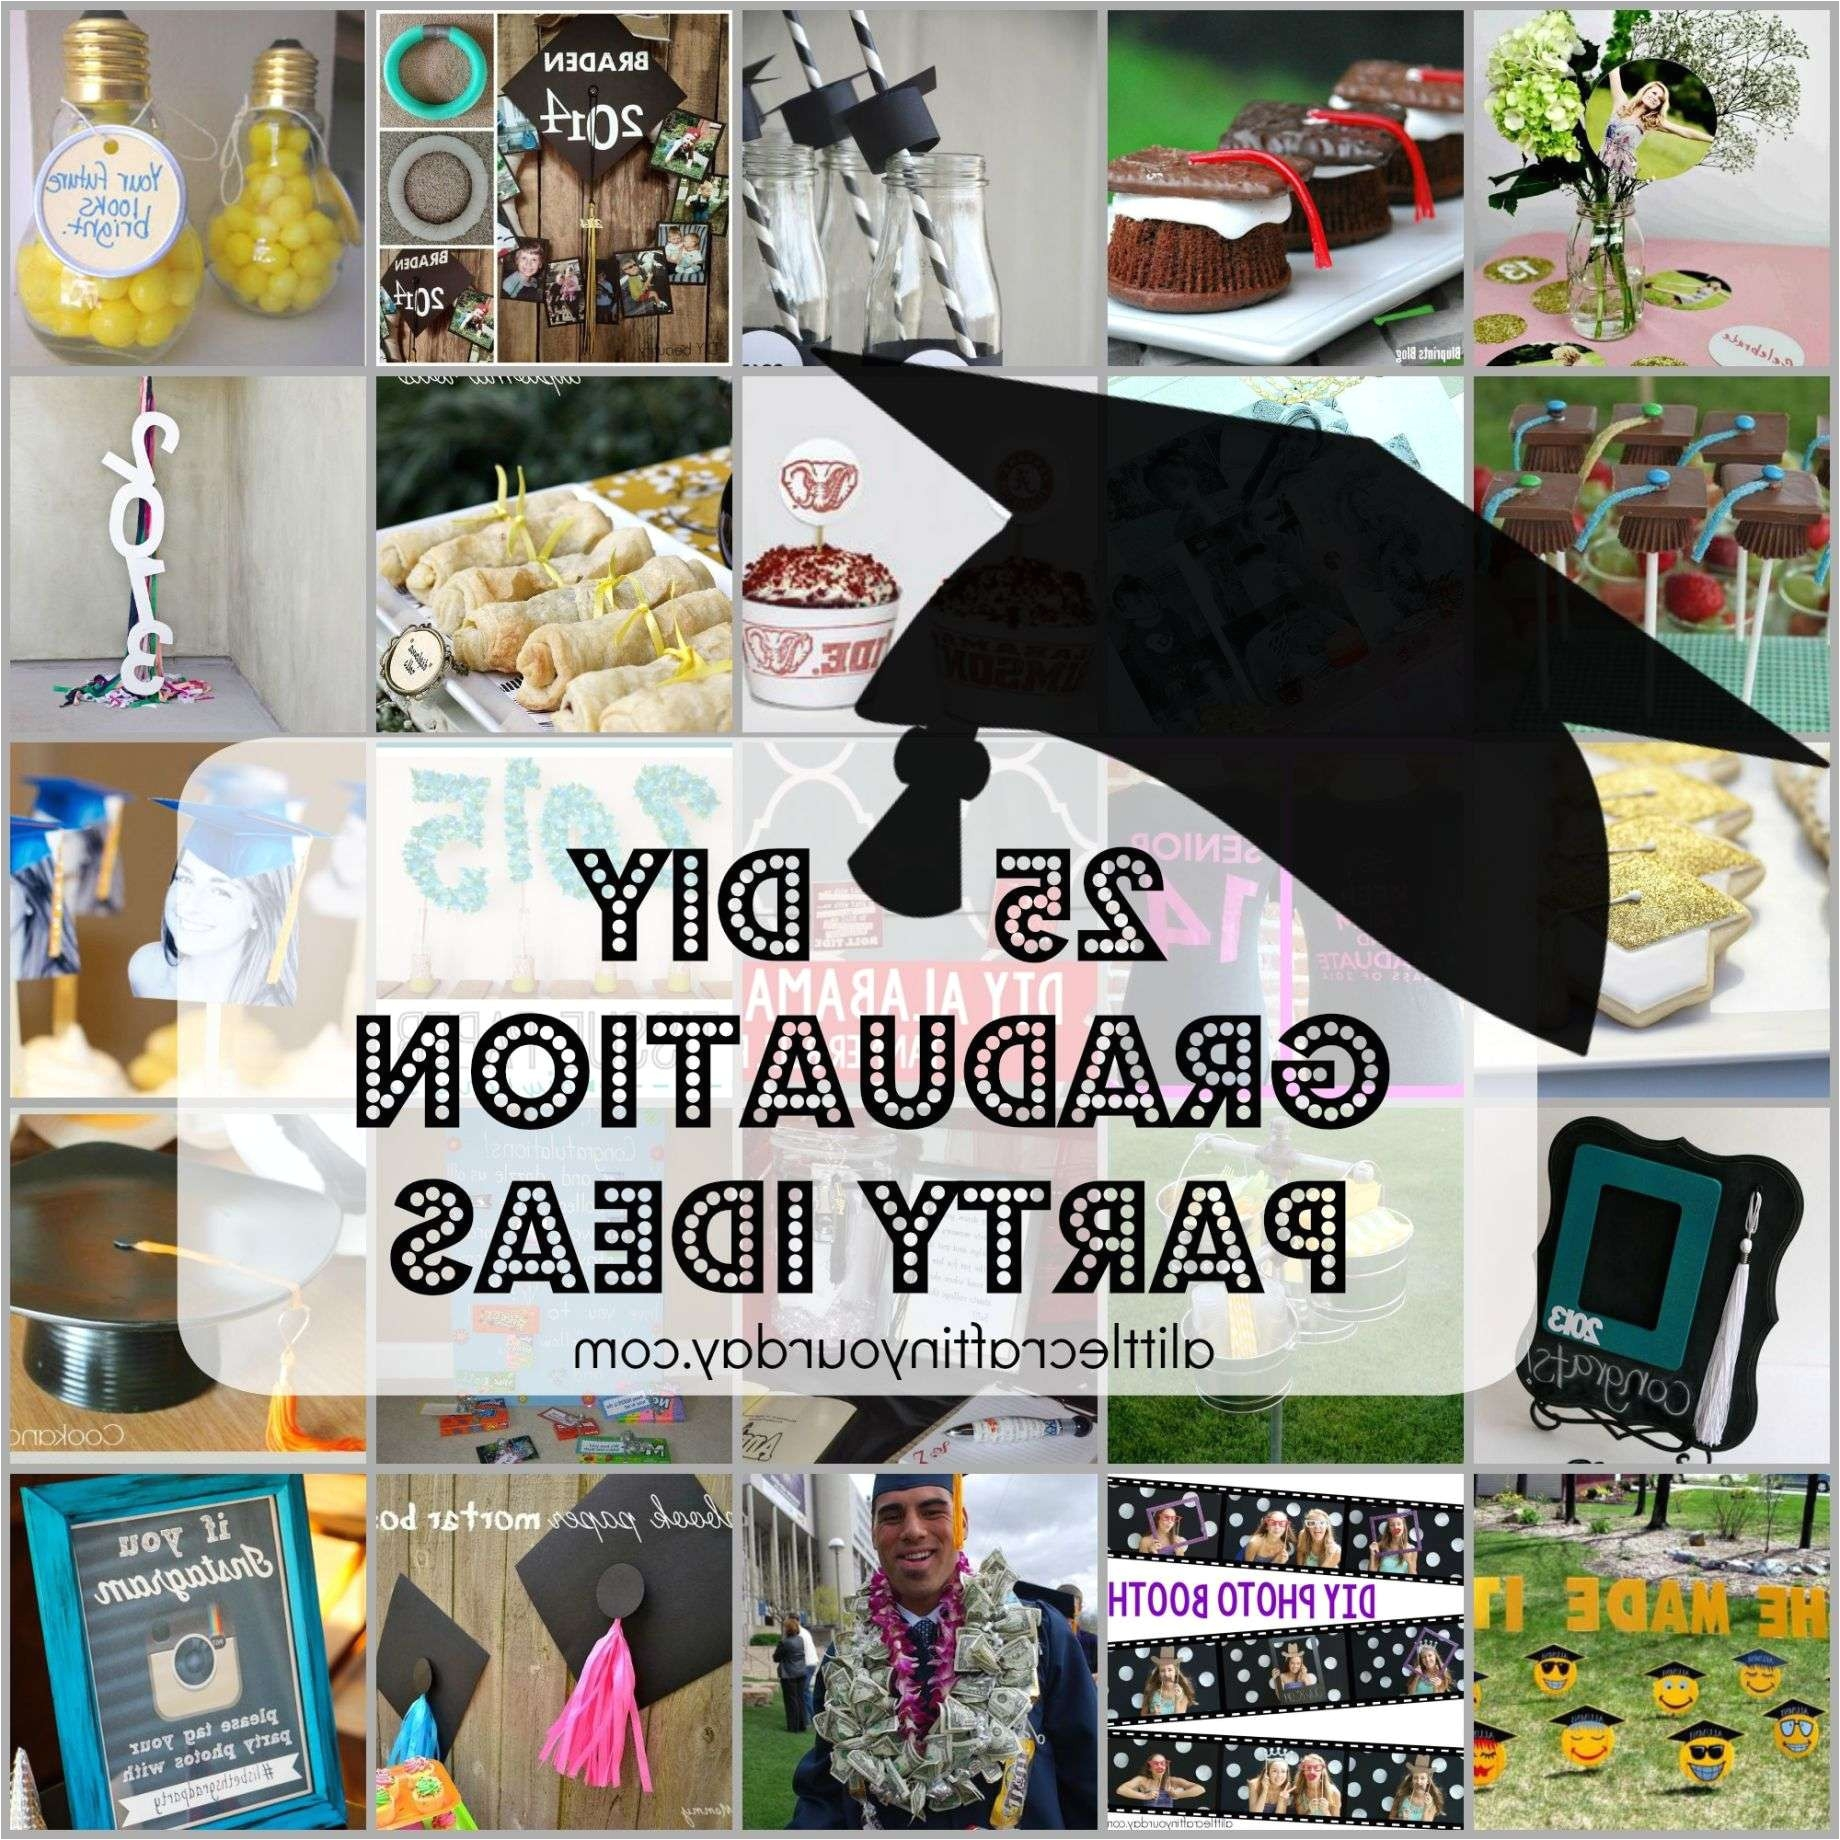 45 fresh backyard graduation party ideas image design ideas inspiration of nurse graduation party decorations